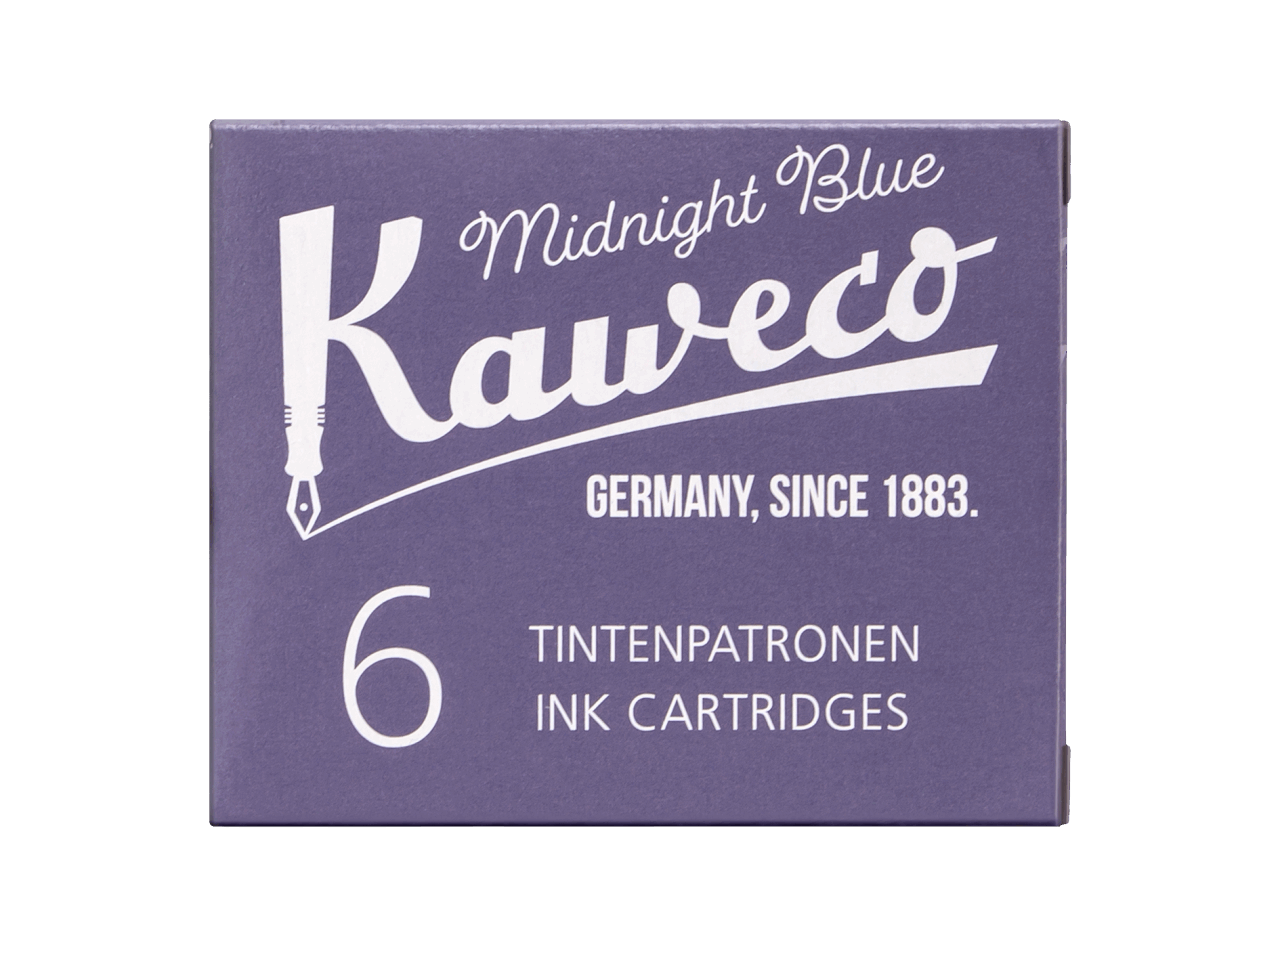 Kaweco Tintenpatronen 6 Stück - Mitternachtsblau